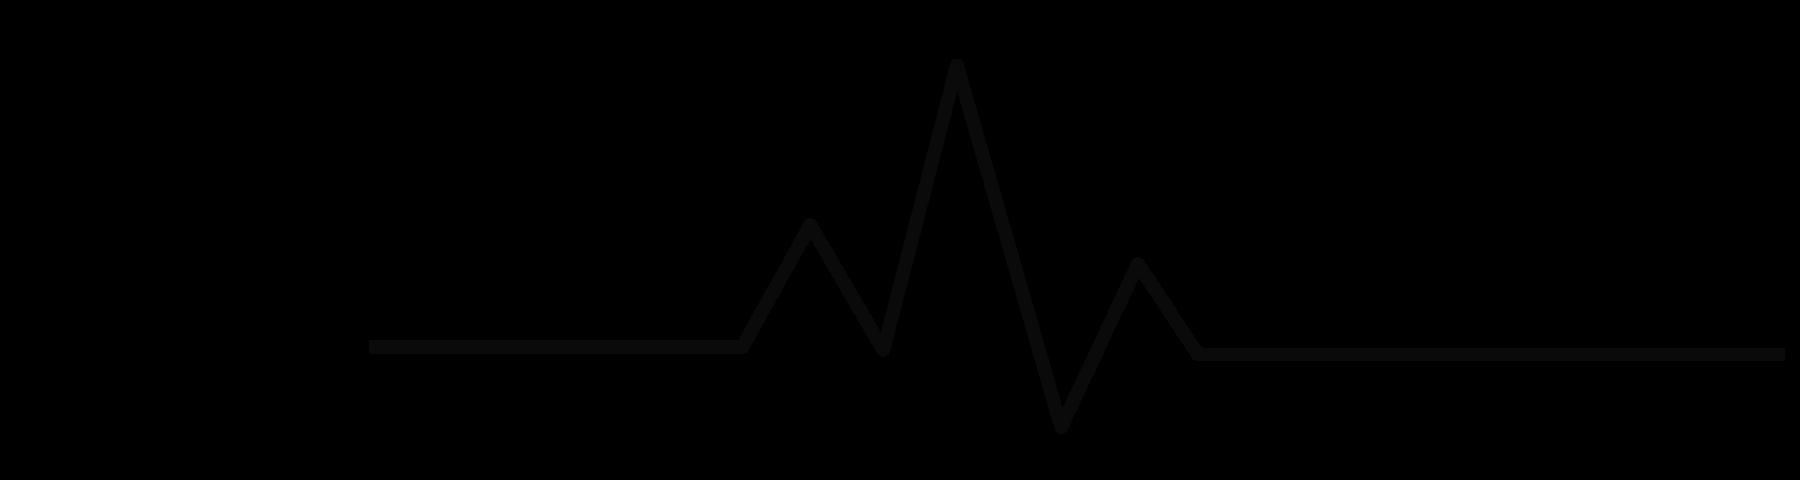 pulse-of-the-pride-logo-ver1b.png